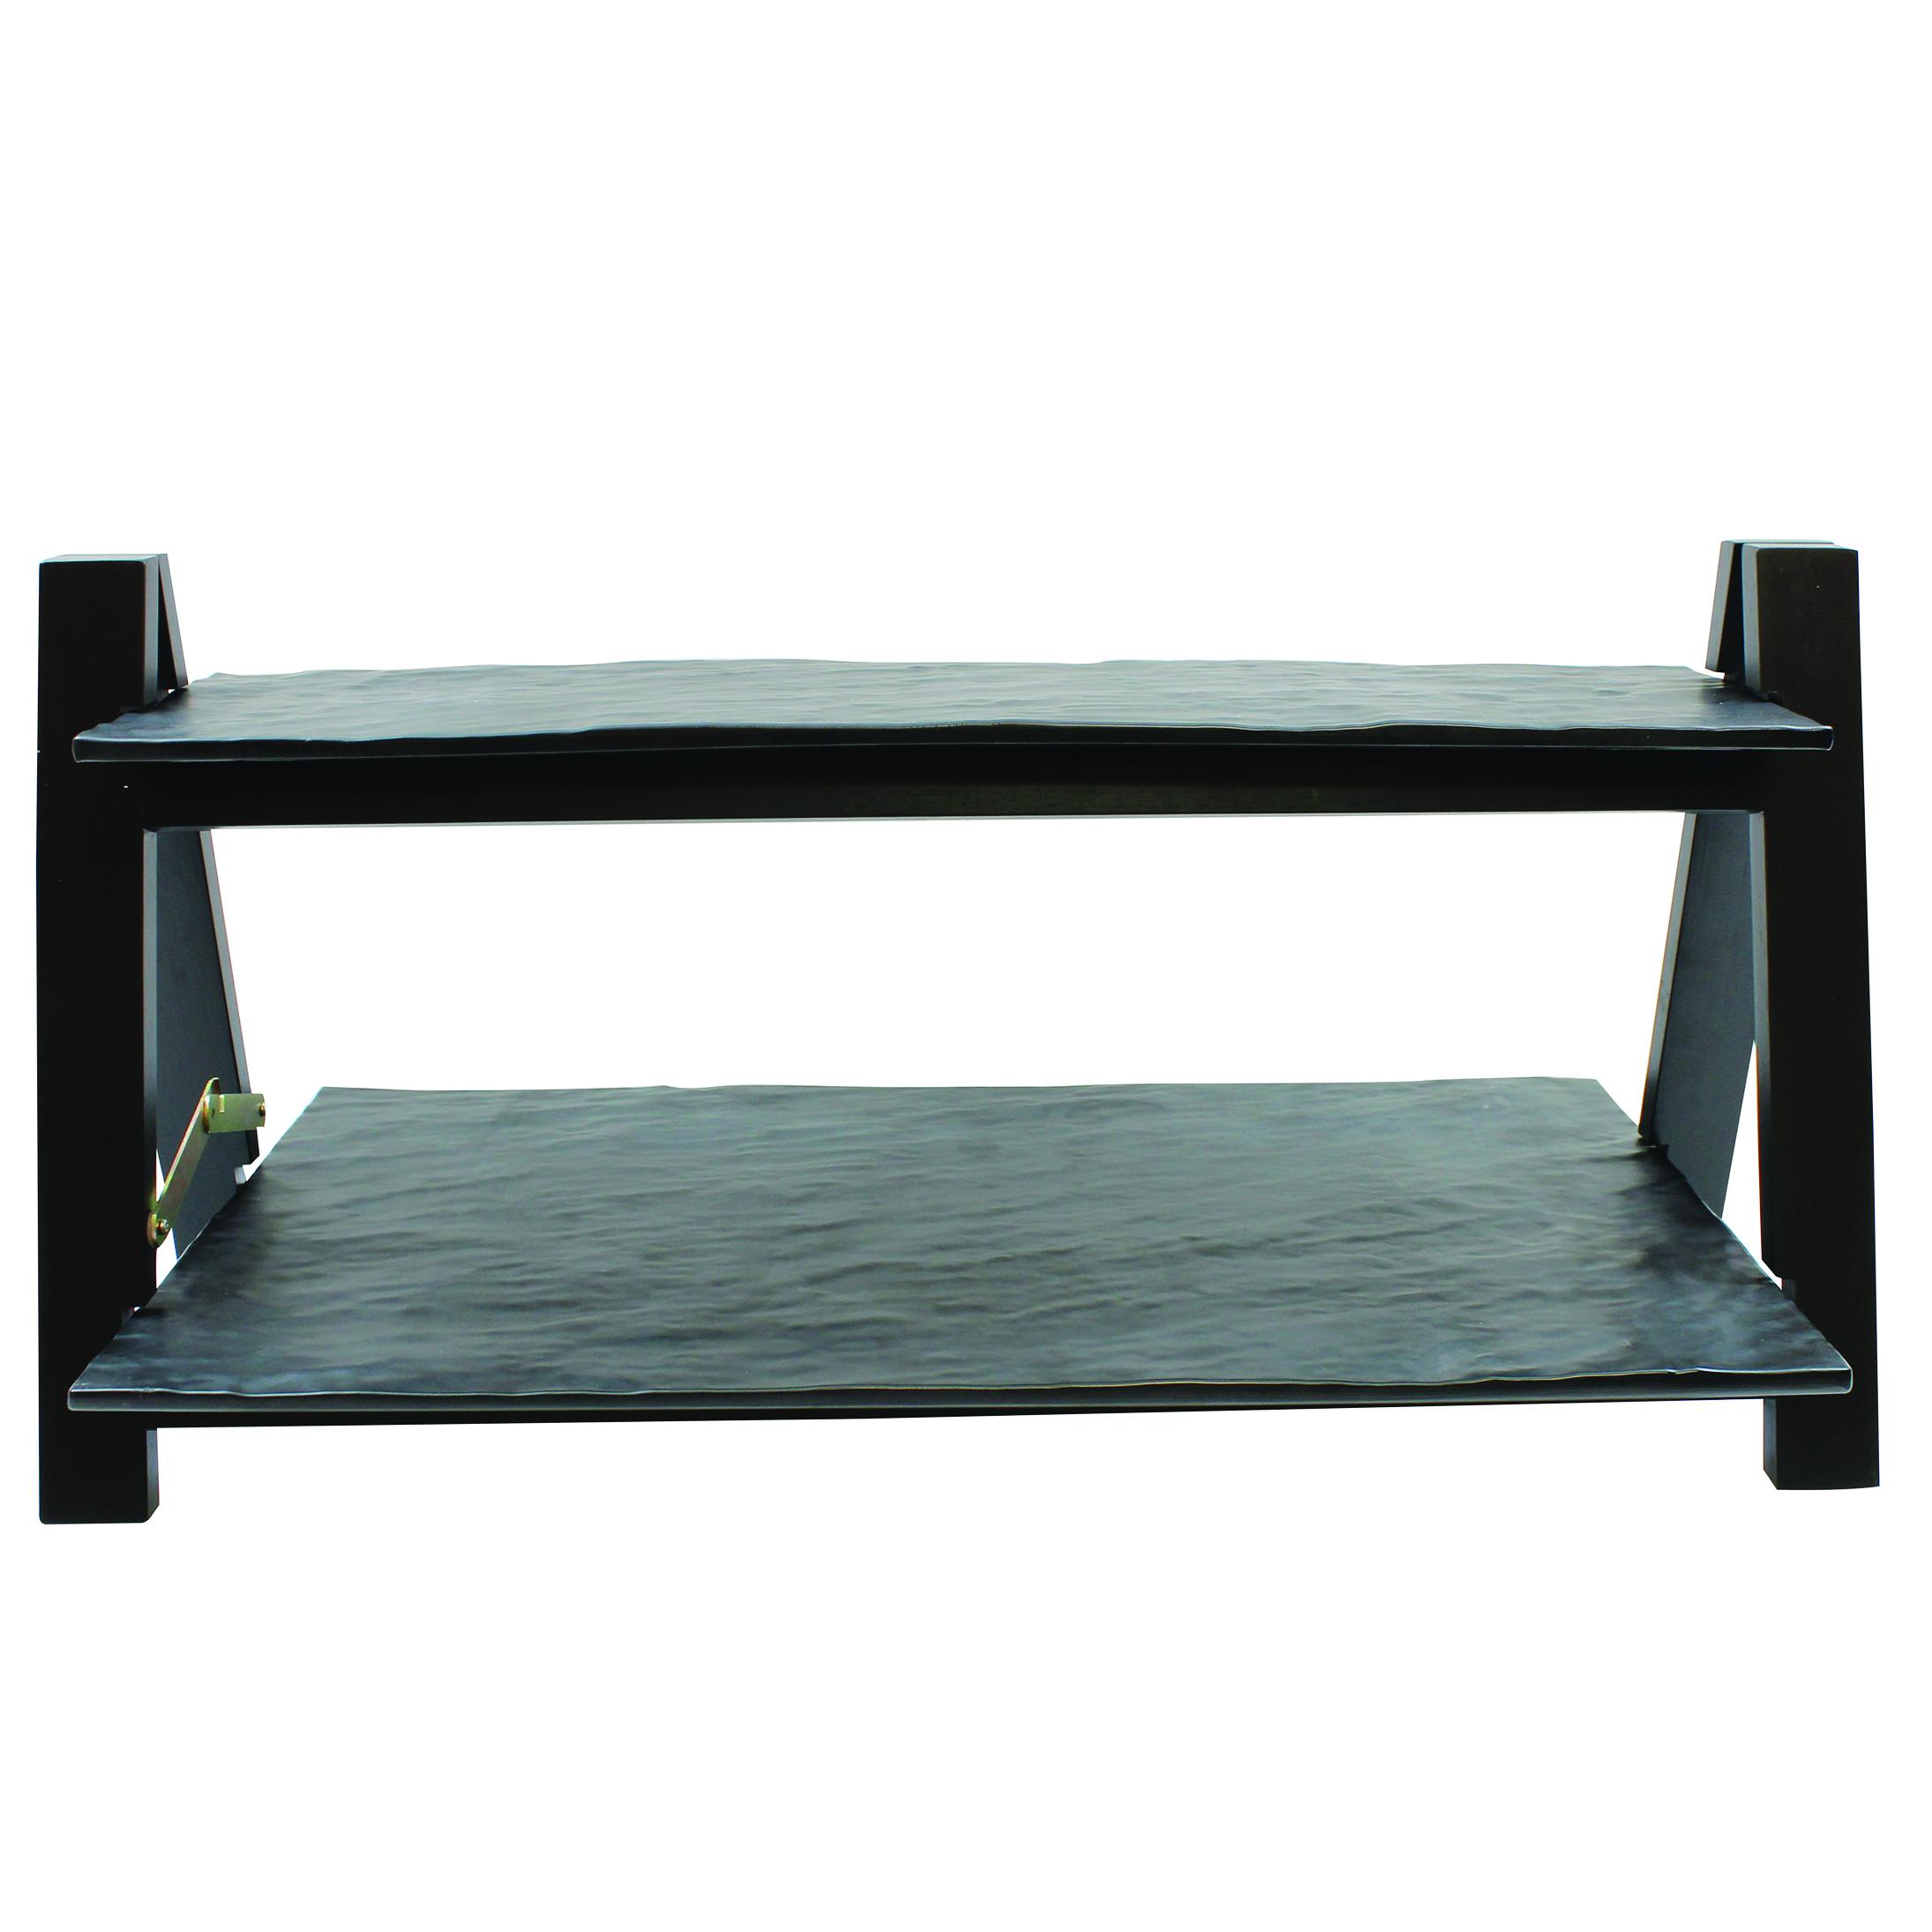 TableCraft Products RMG1KITBK display riser, individual